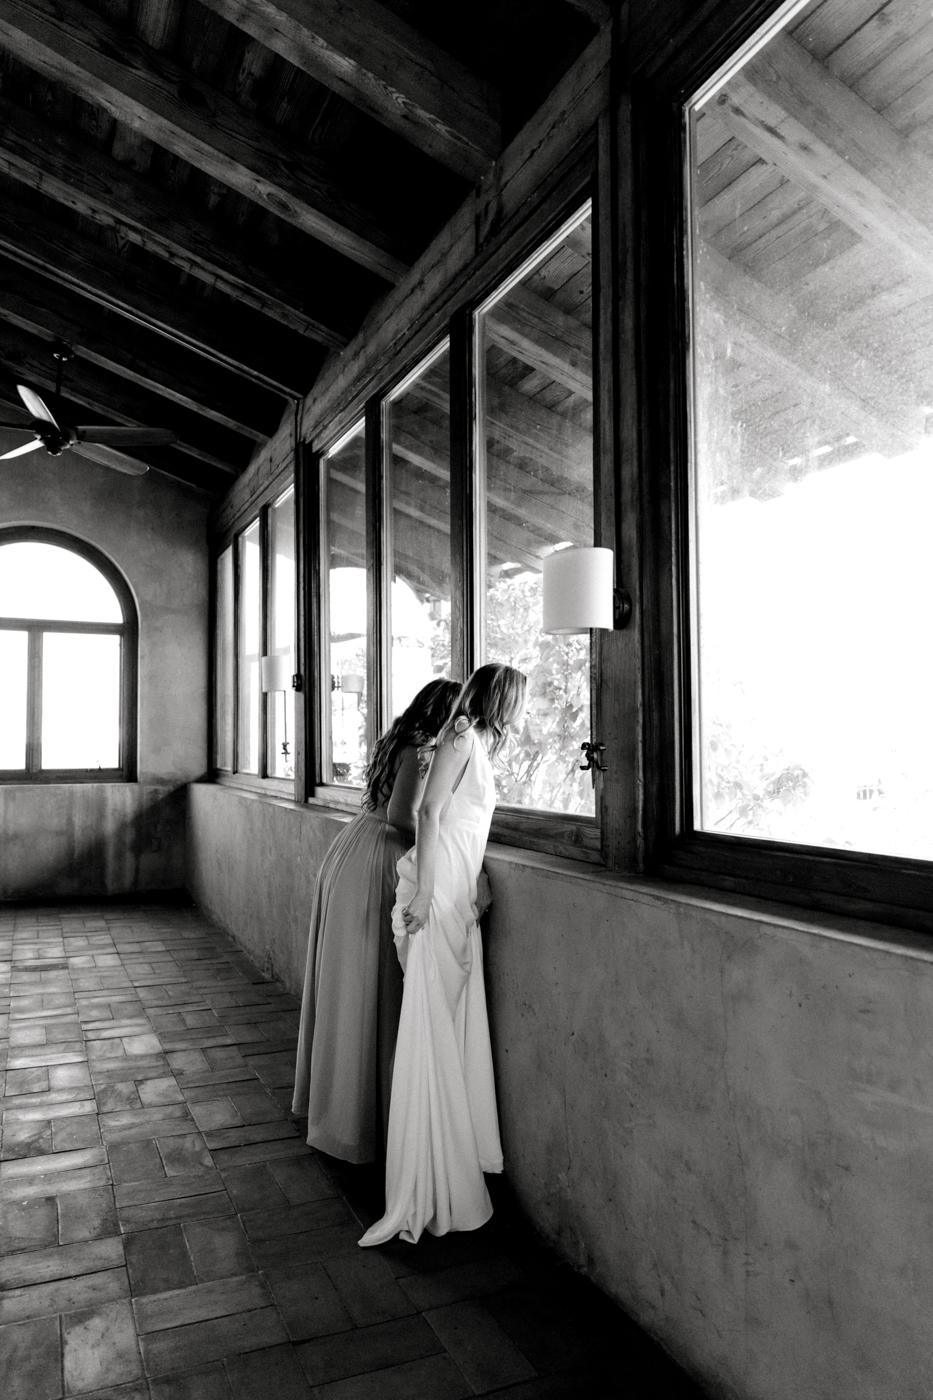 four corners photography best atlanta wedding photographer summerour wedding summer atlanta wedding photographer summerour wedding photos atlanta wedding photo inspiration-33.jpg